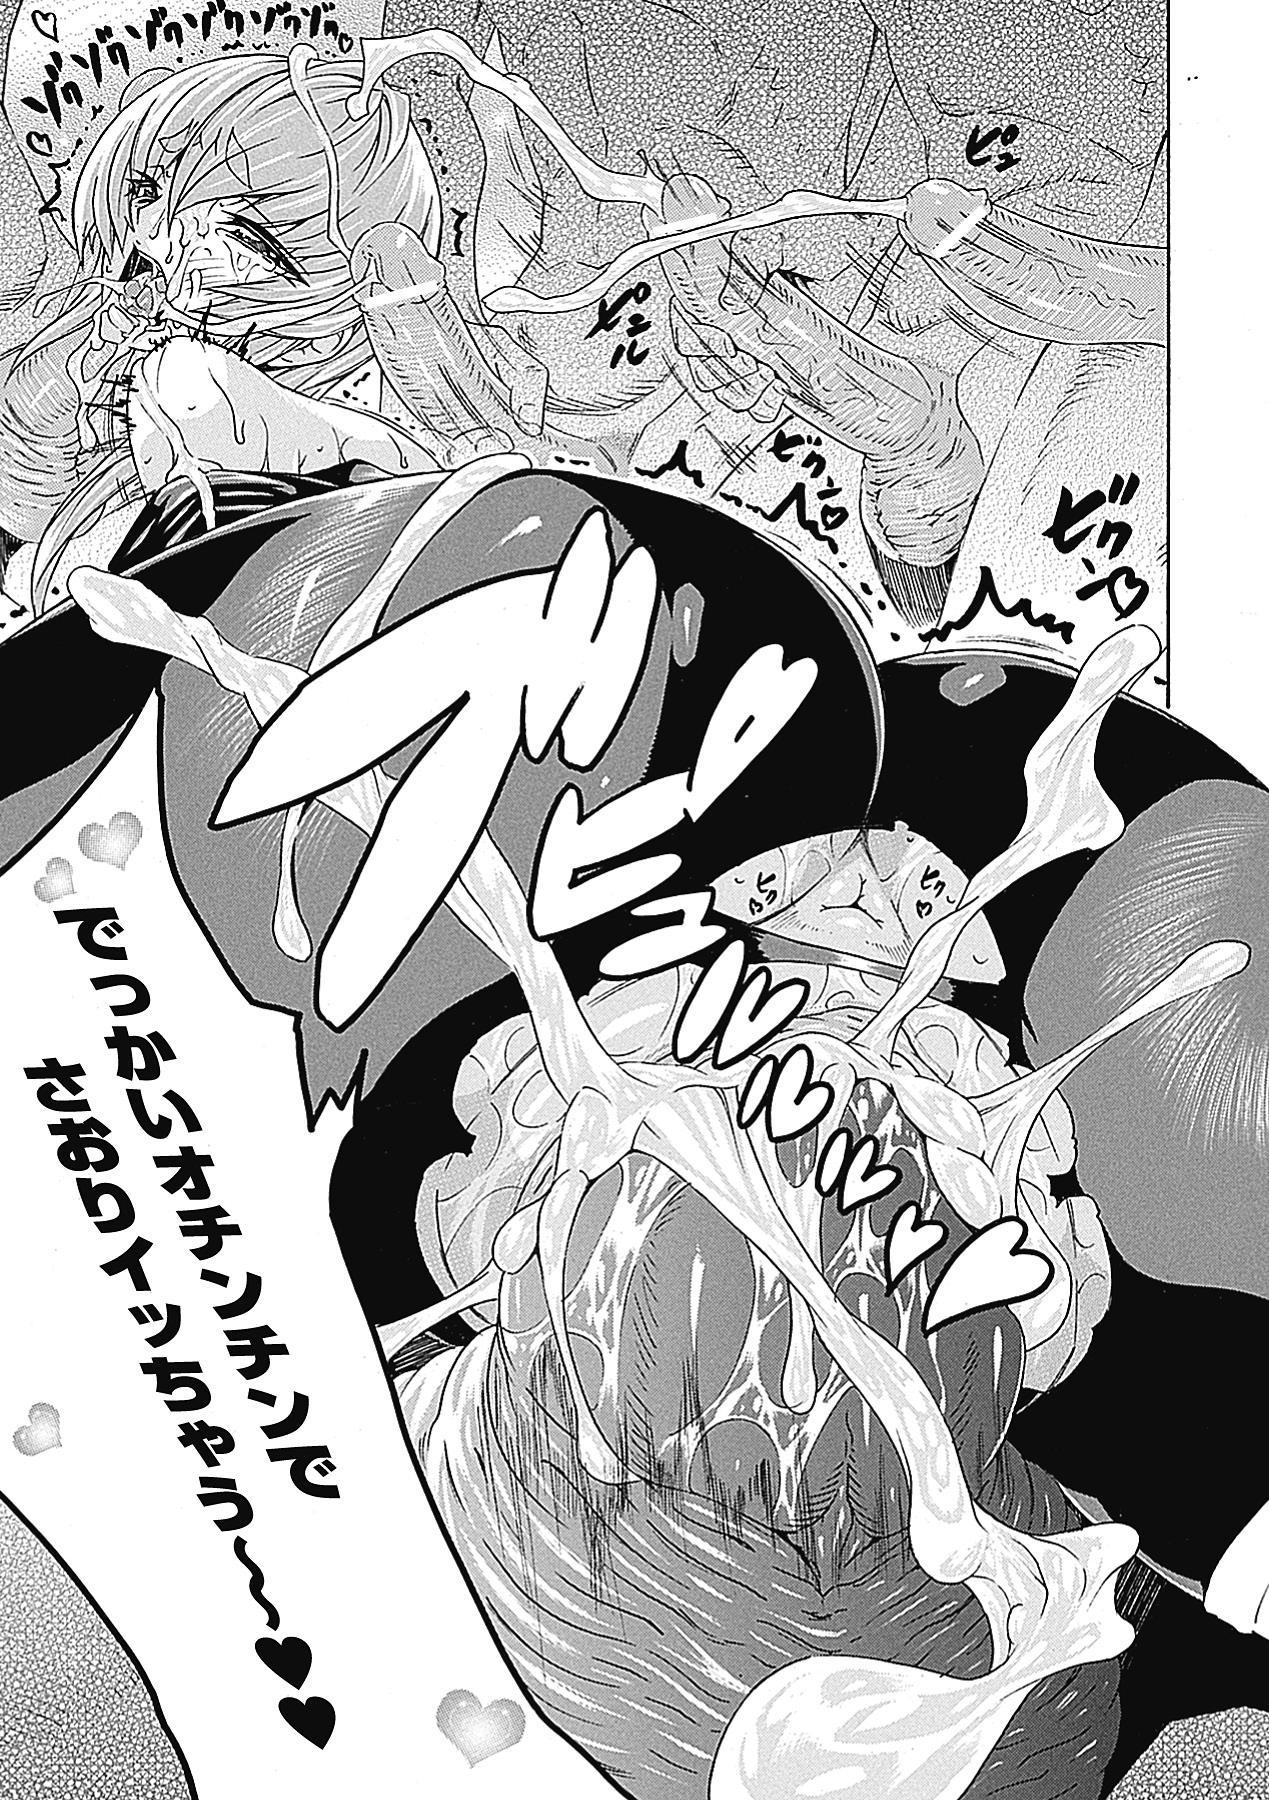 Megami Crisis 1 89